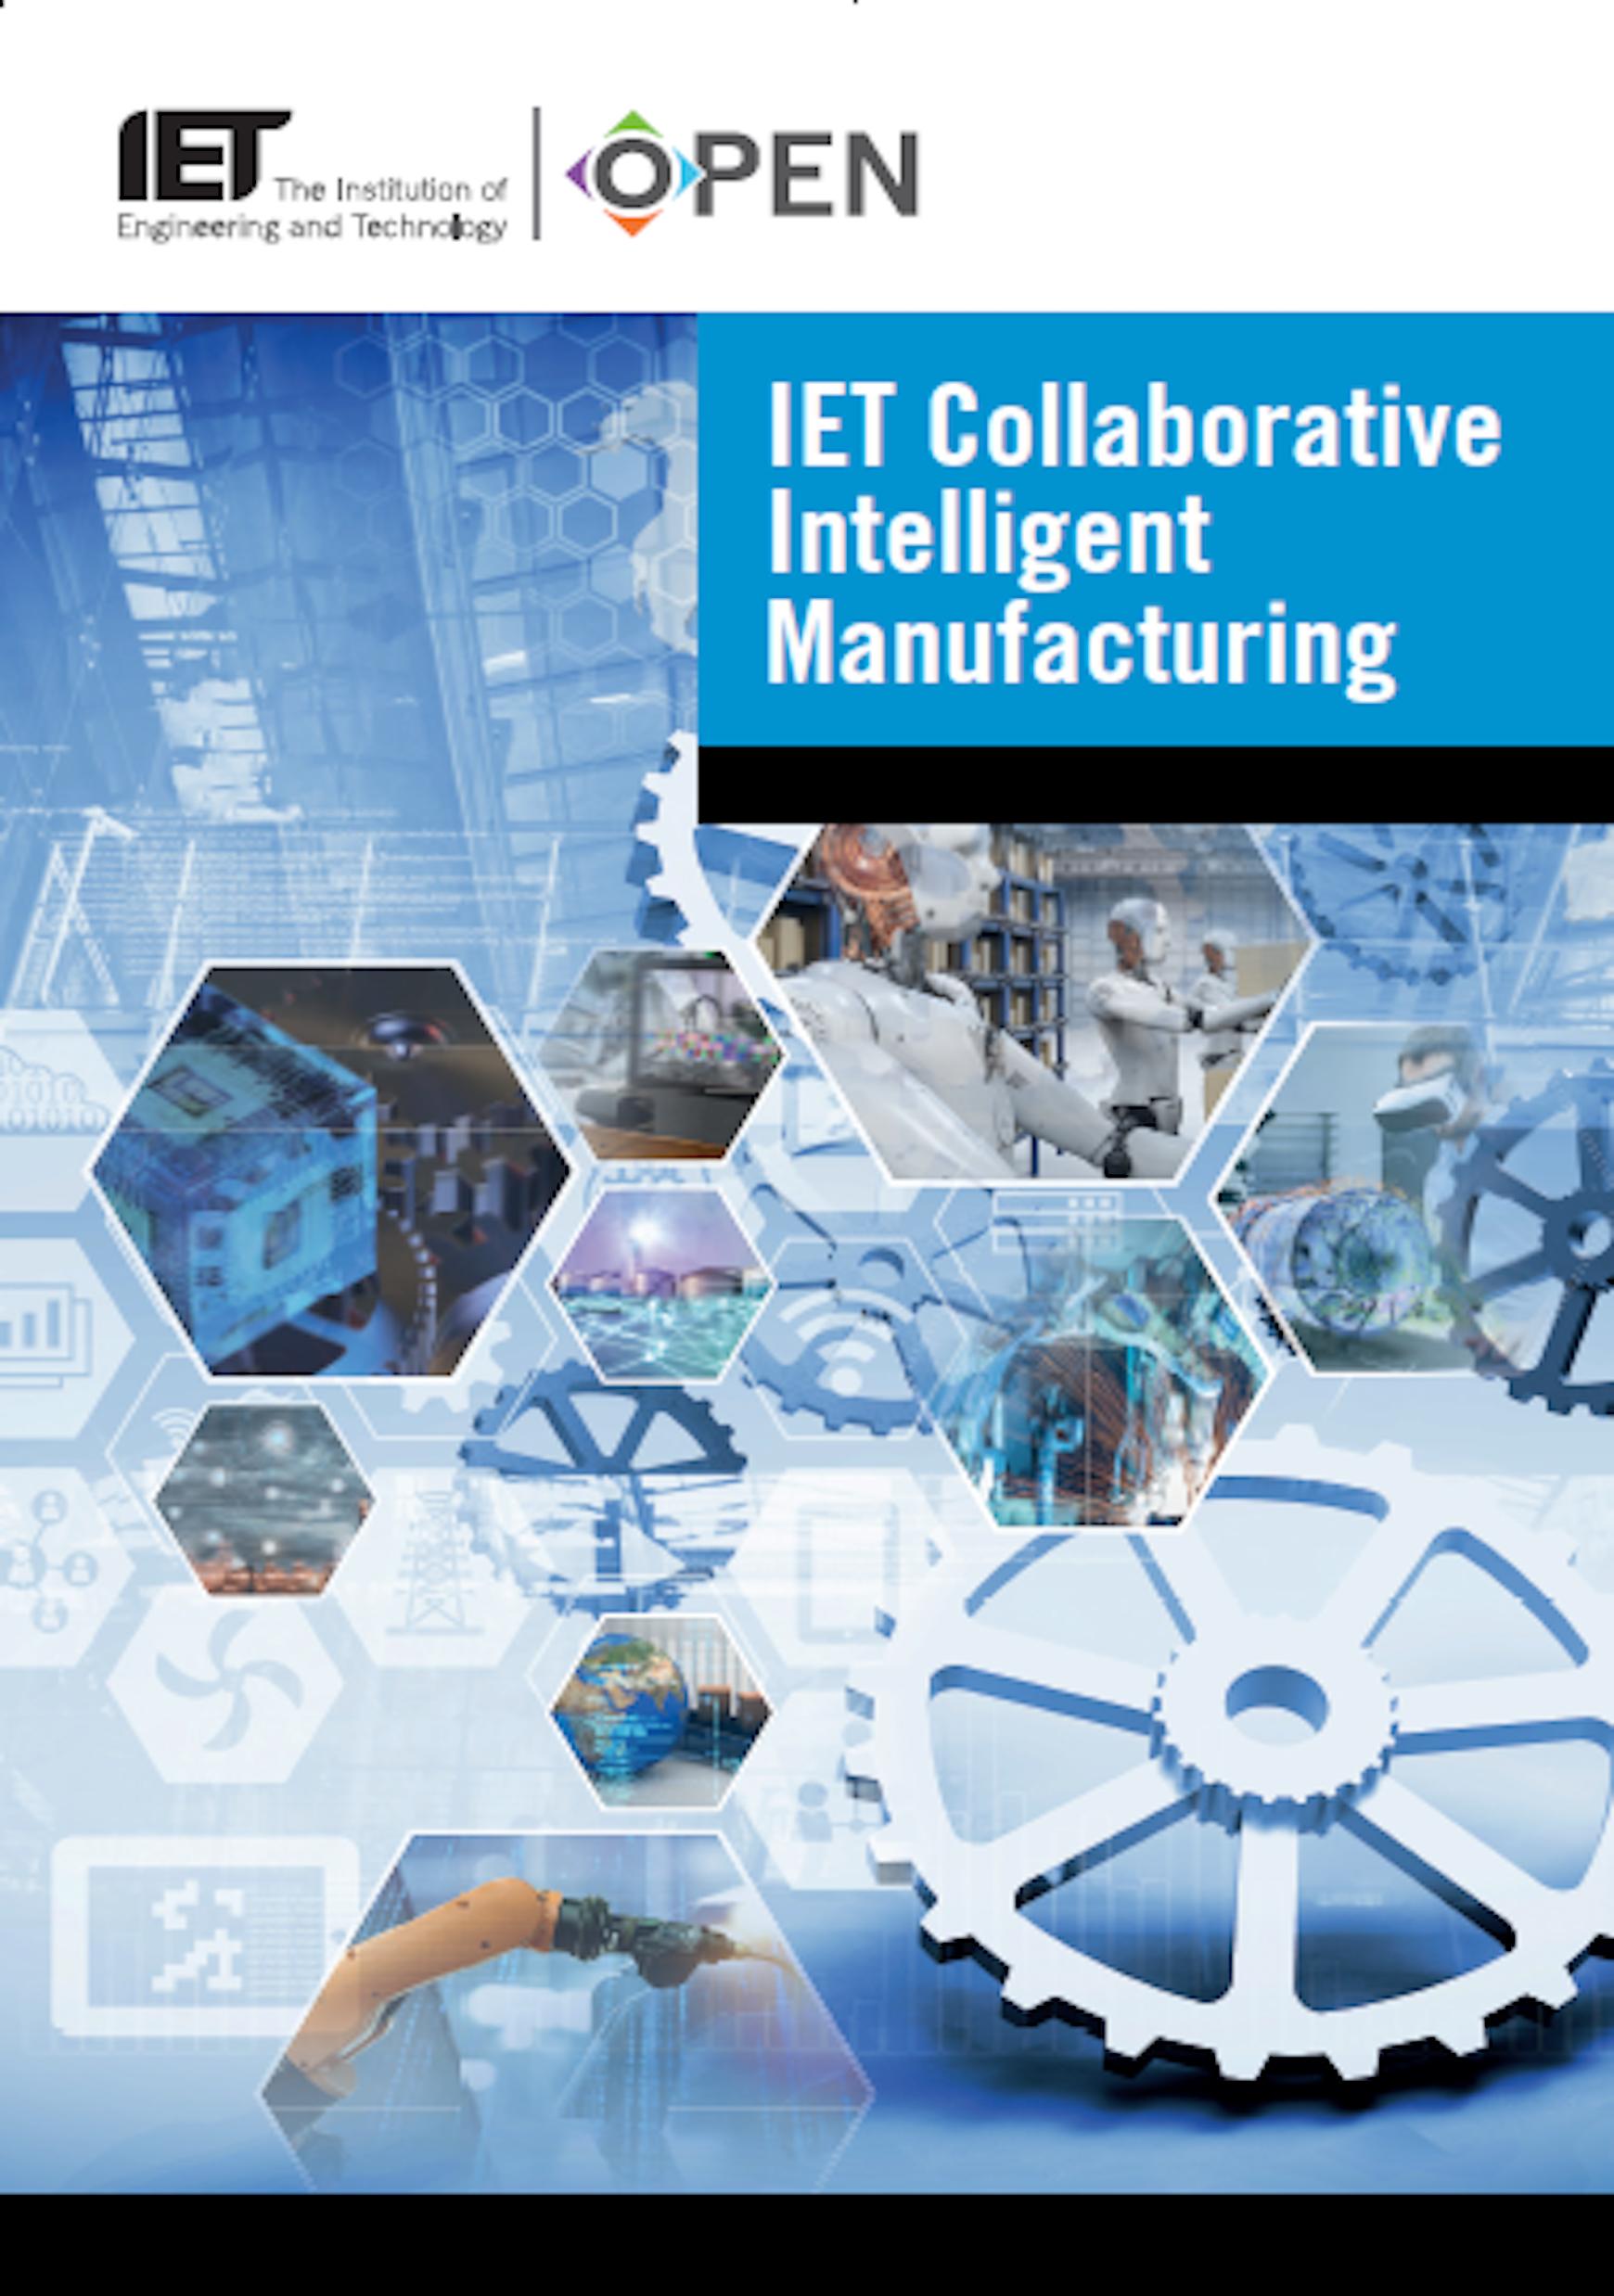 matchmaking industrial revolution